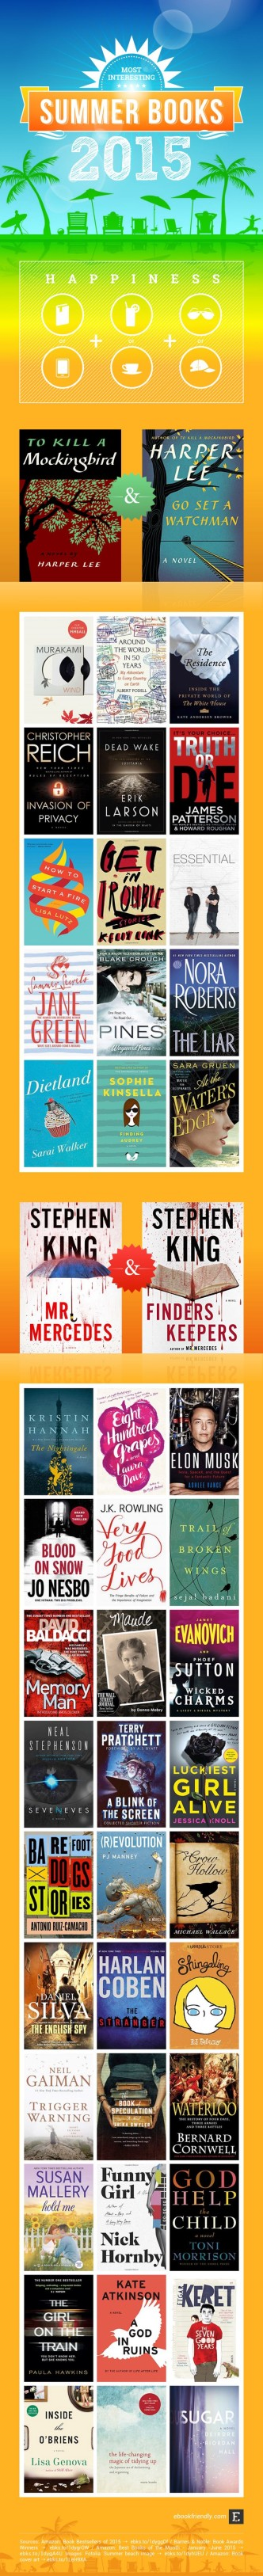 Best summer books 2015 - infographic